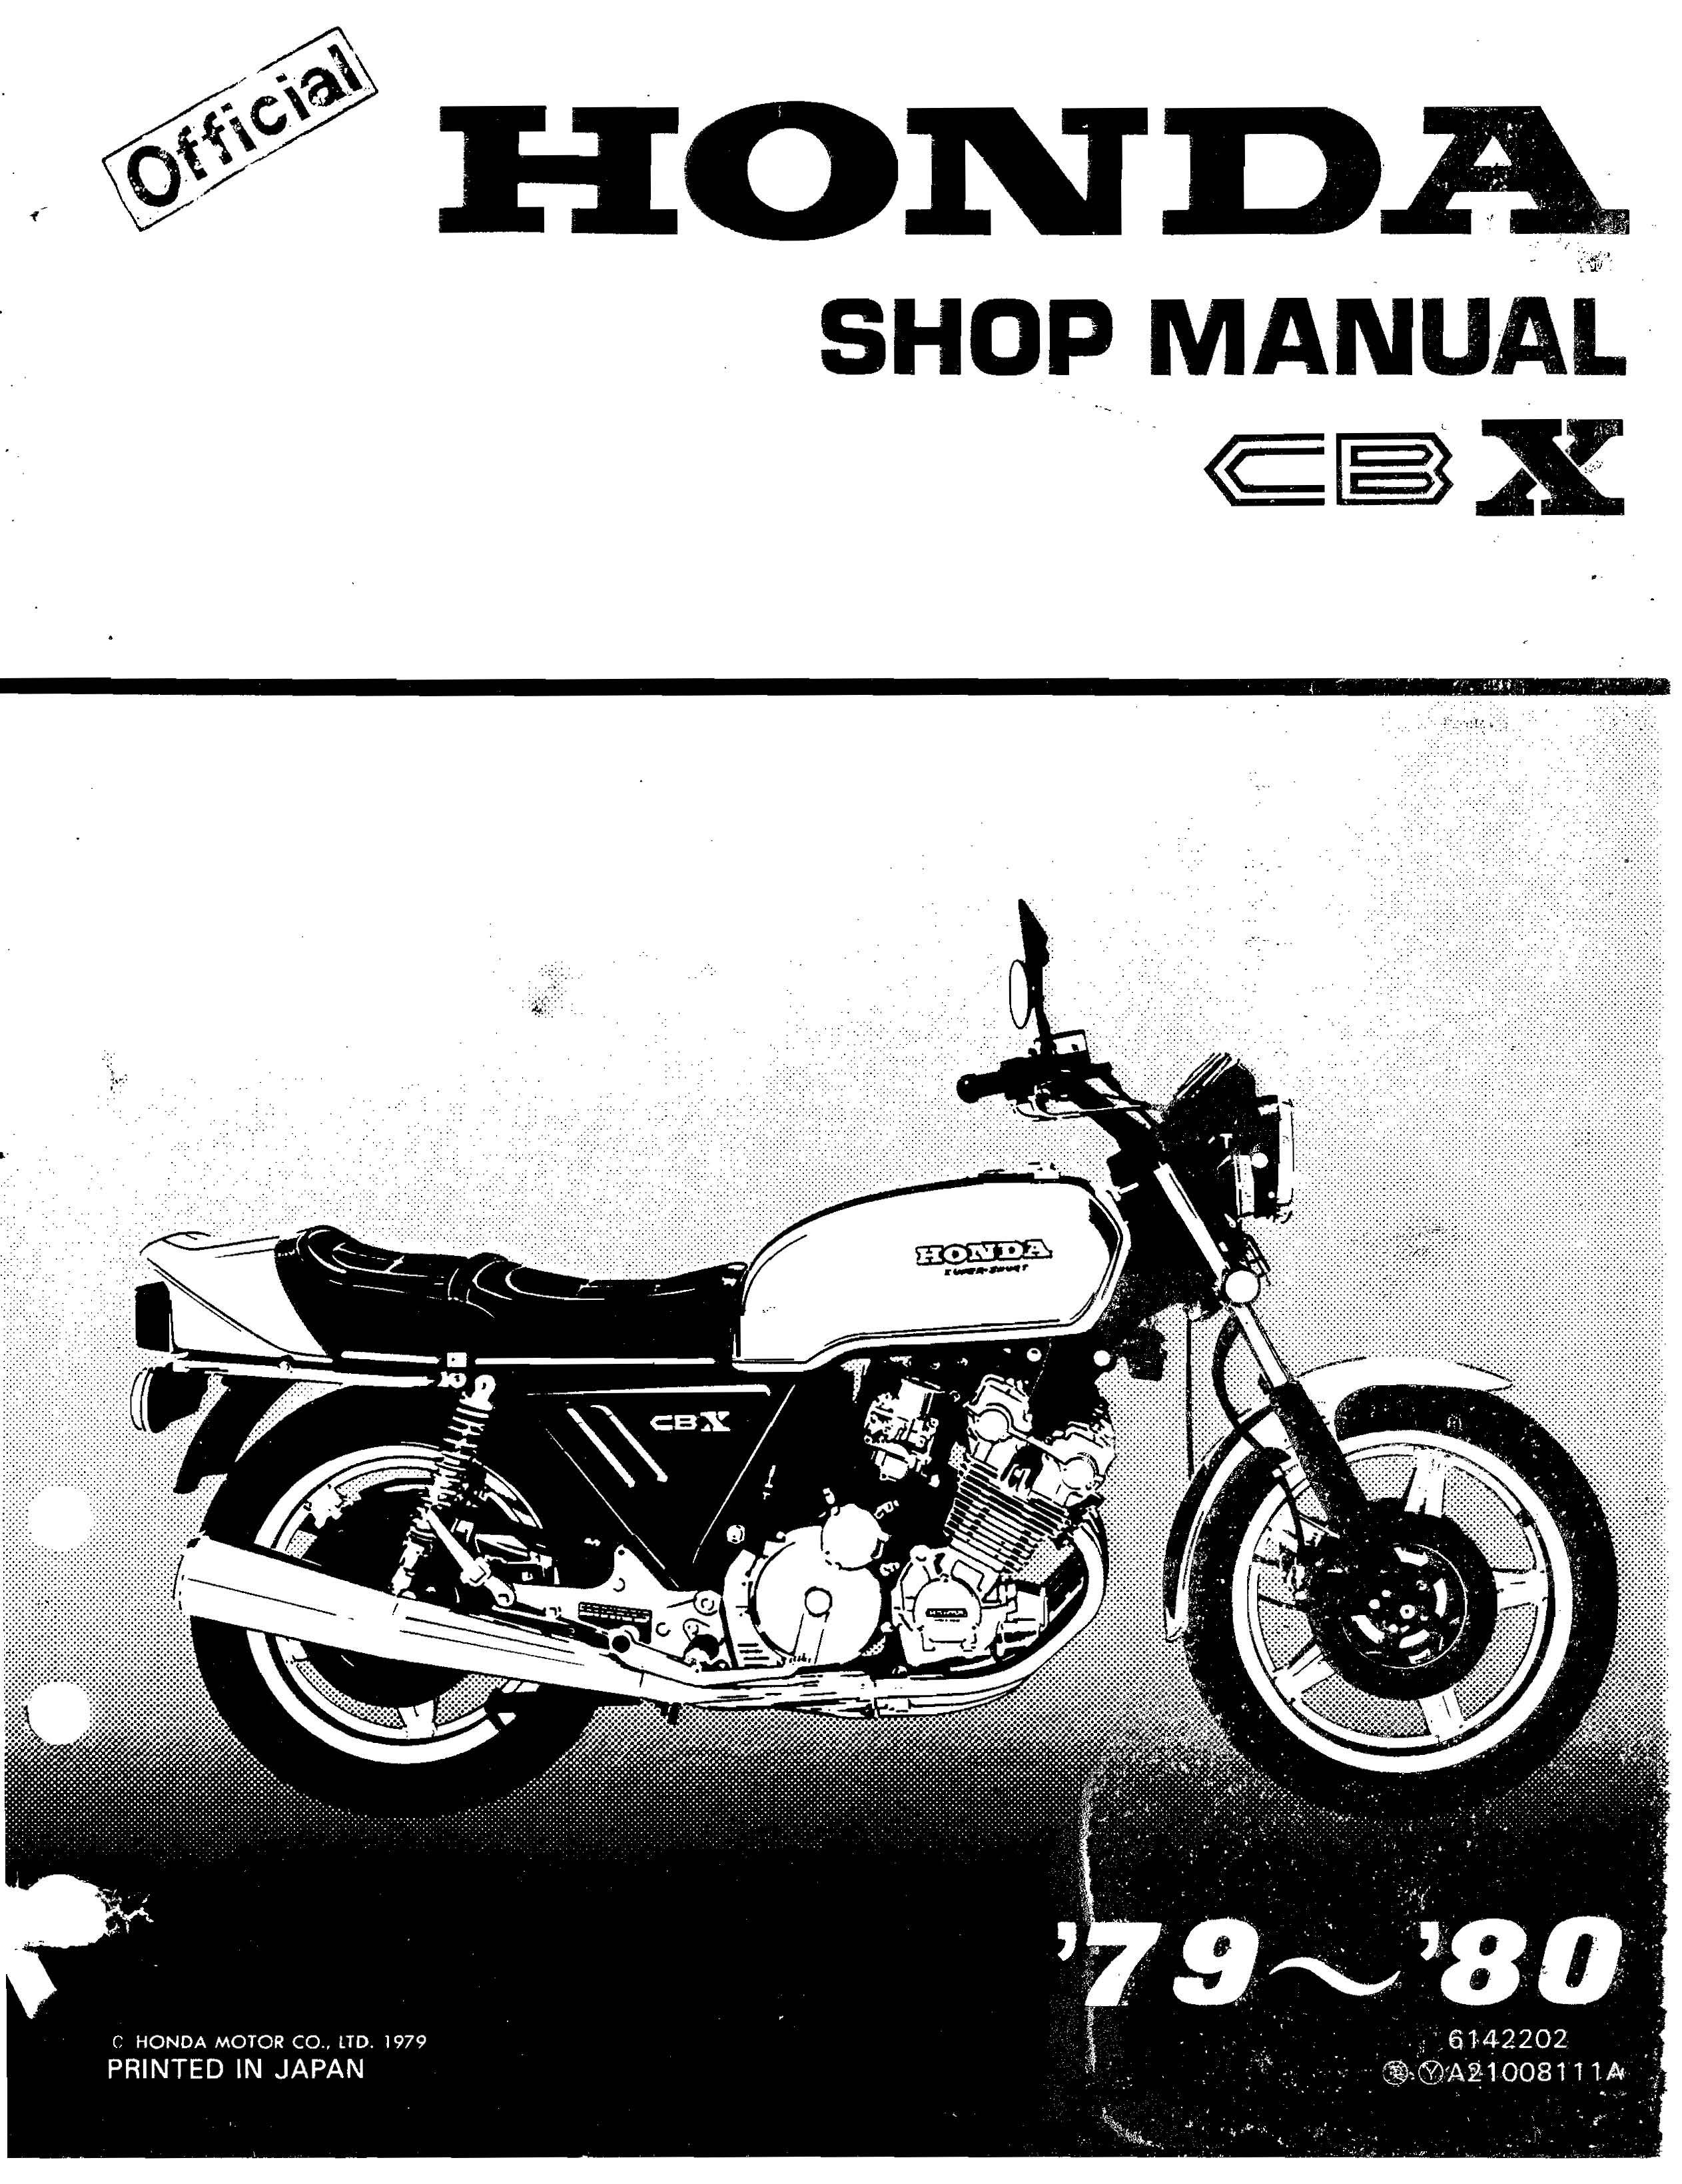 Workshop manual for the Honda CBX (1979 - 1980)